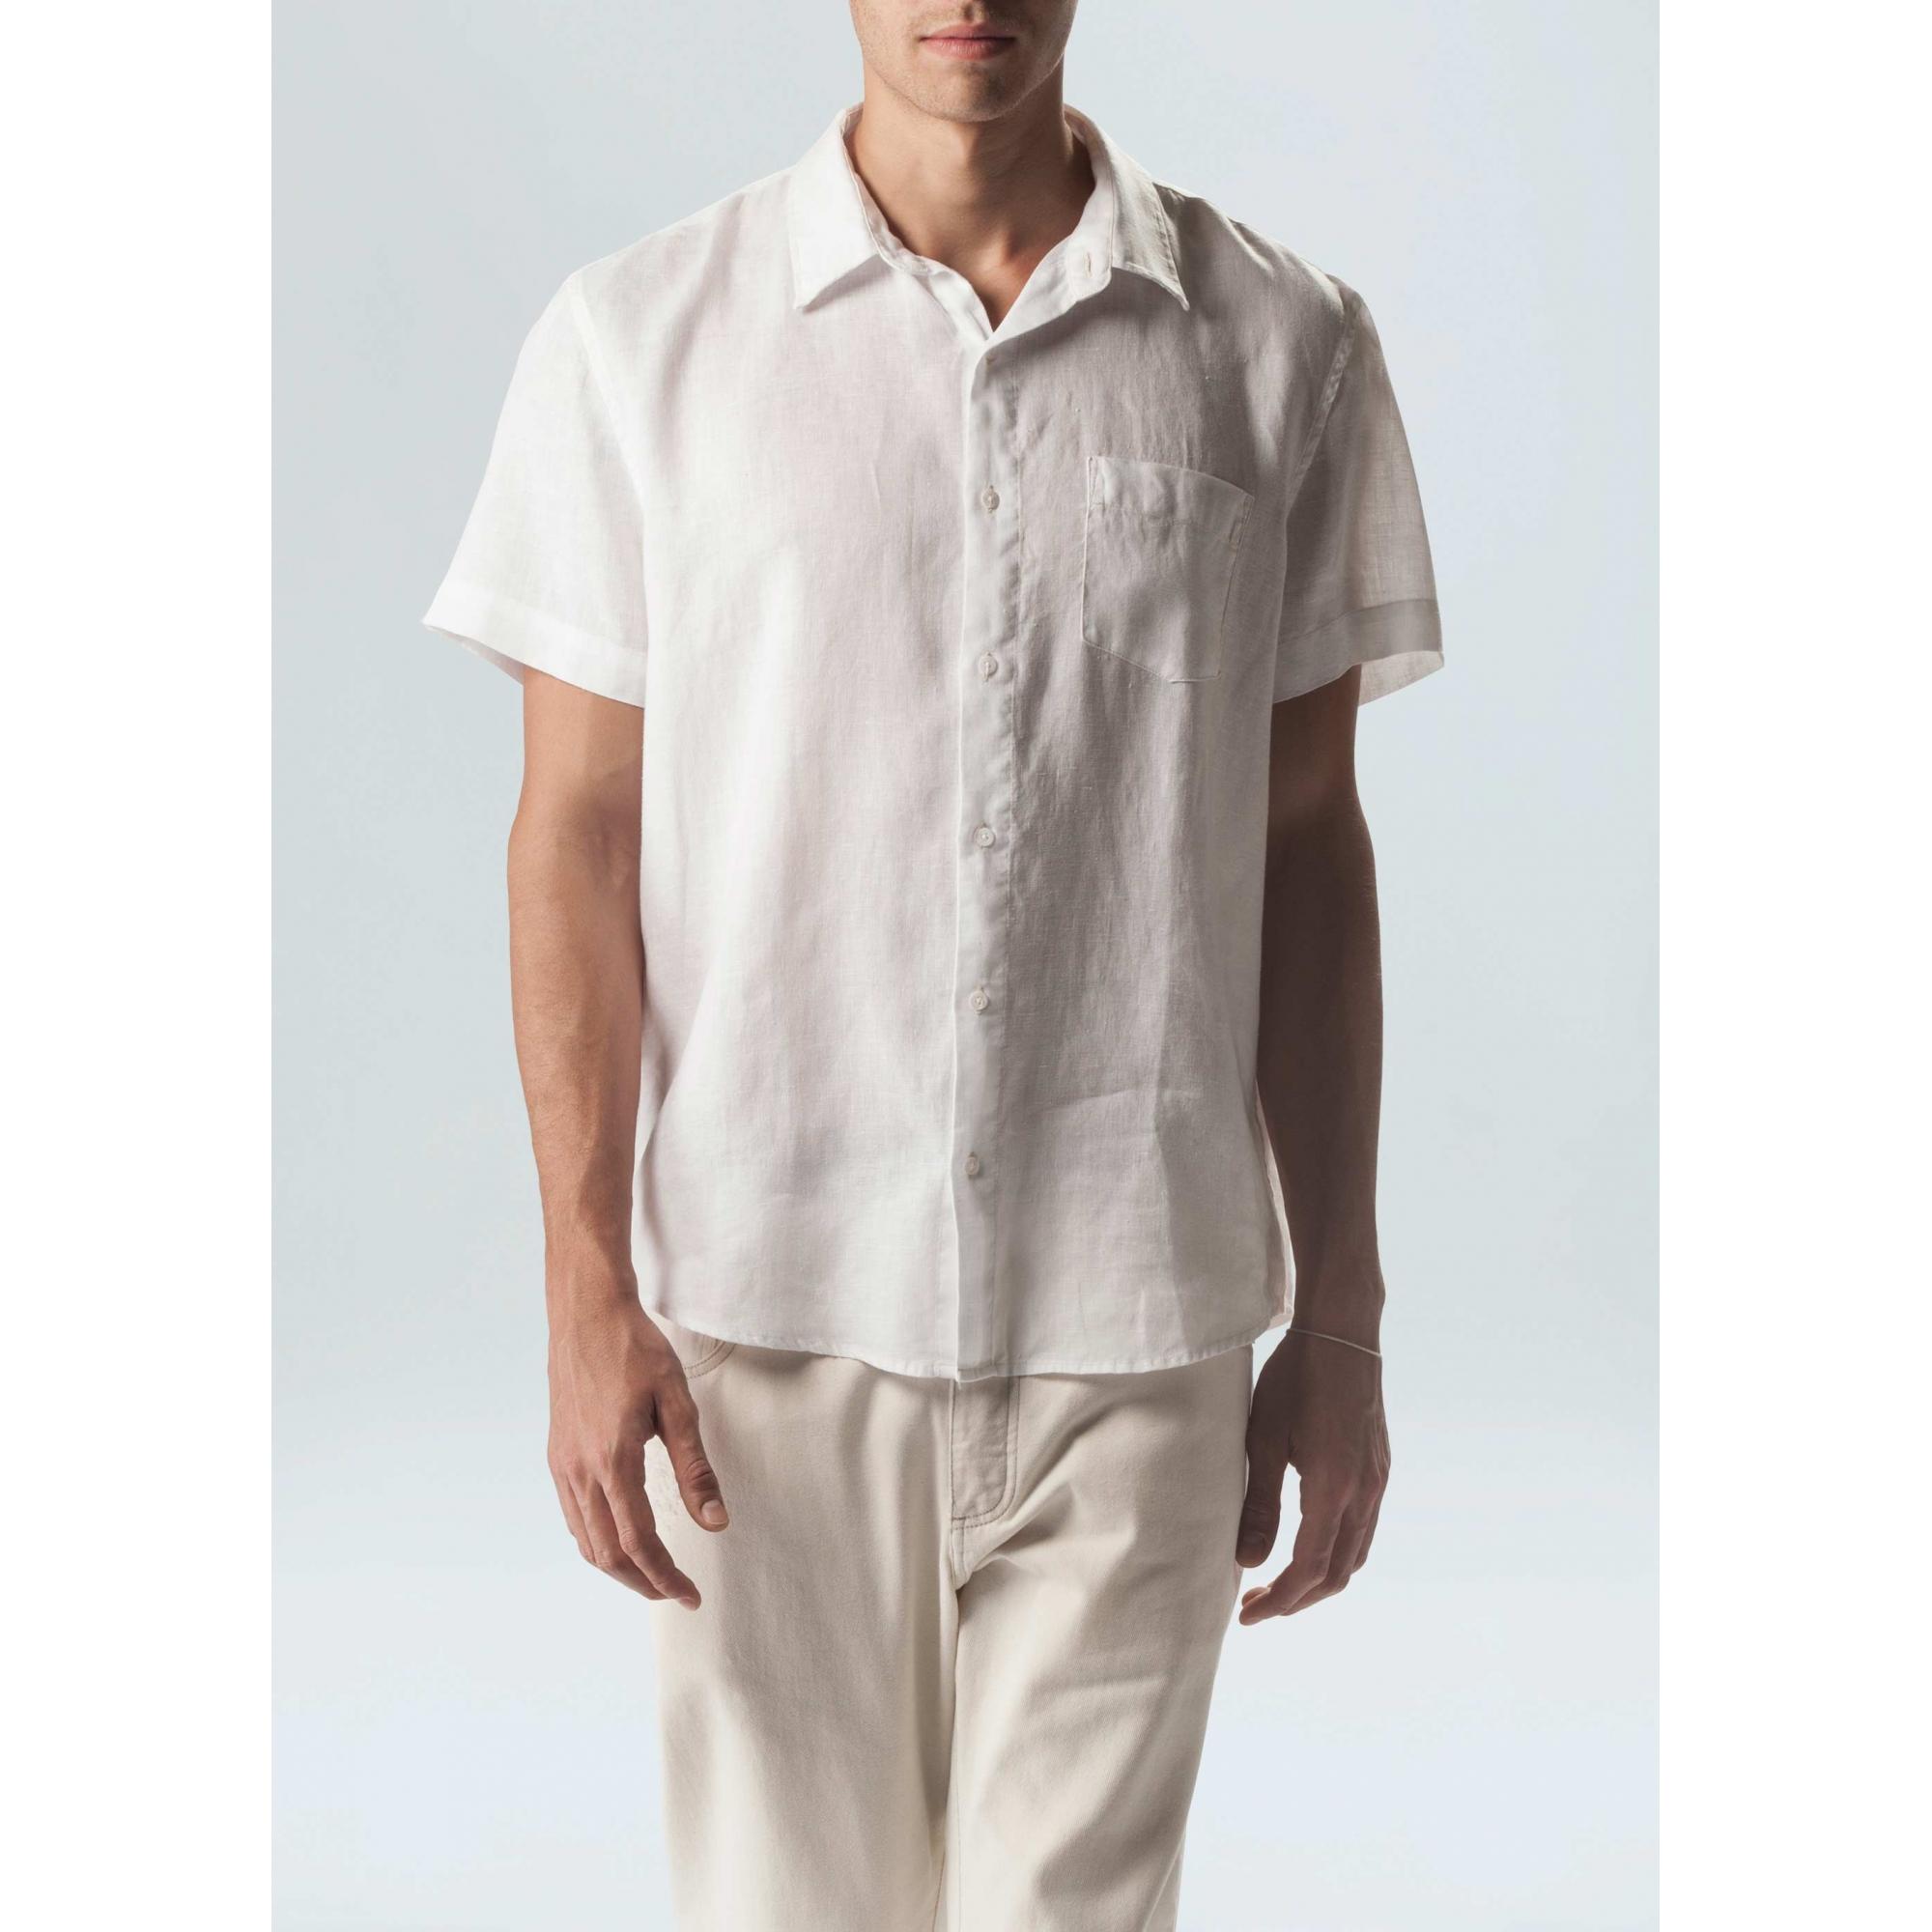 Osklen Camisa Classic Linen Manga Curta Masculino Branco